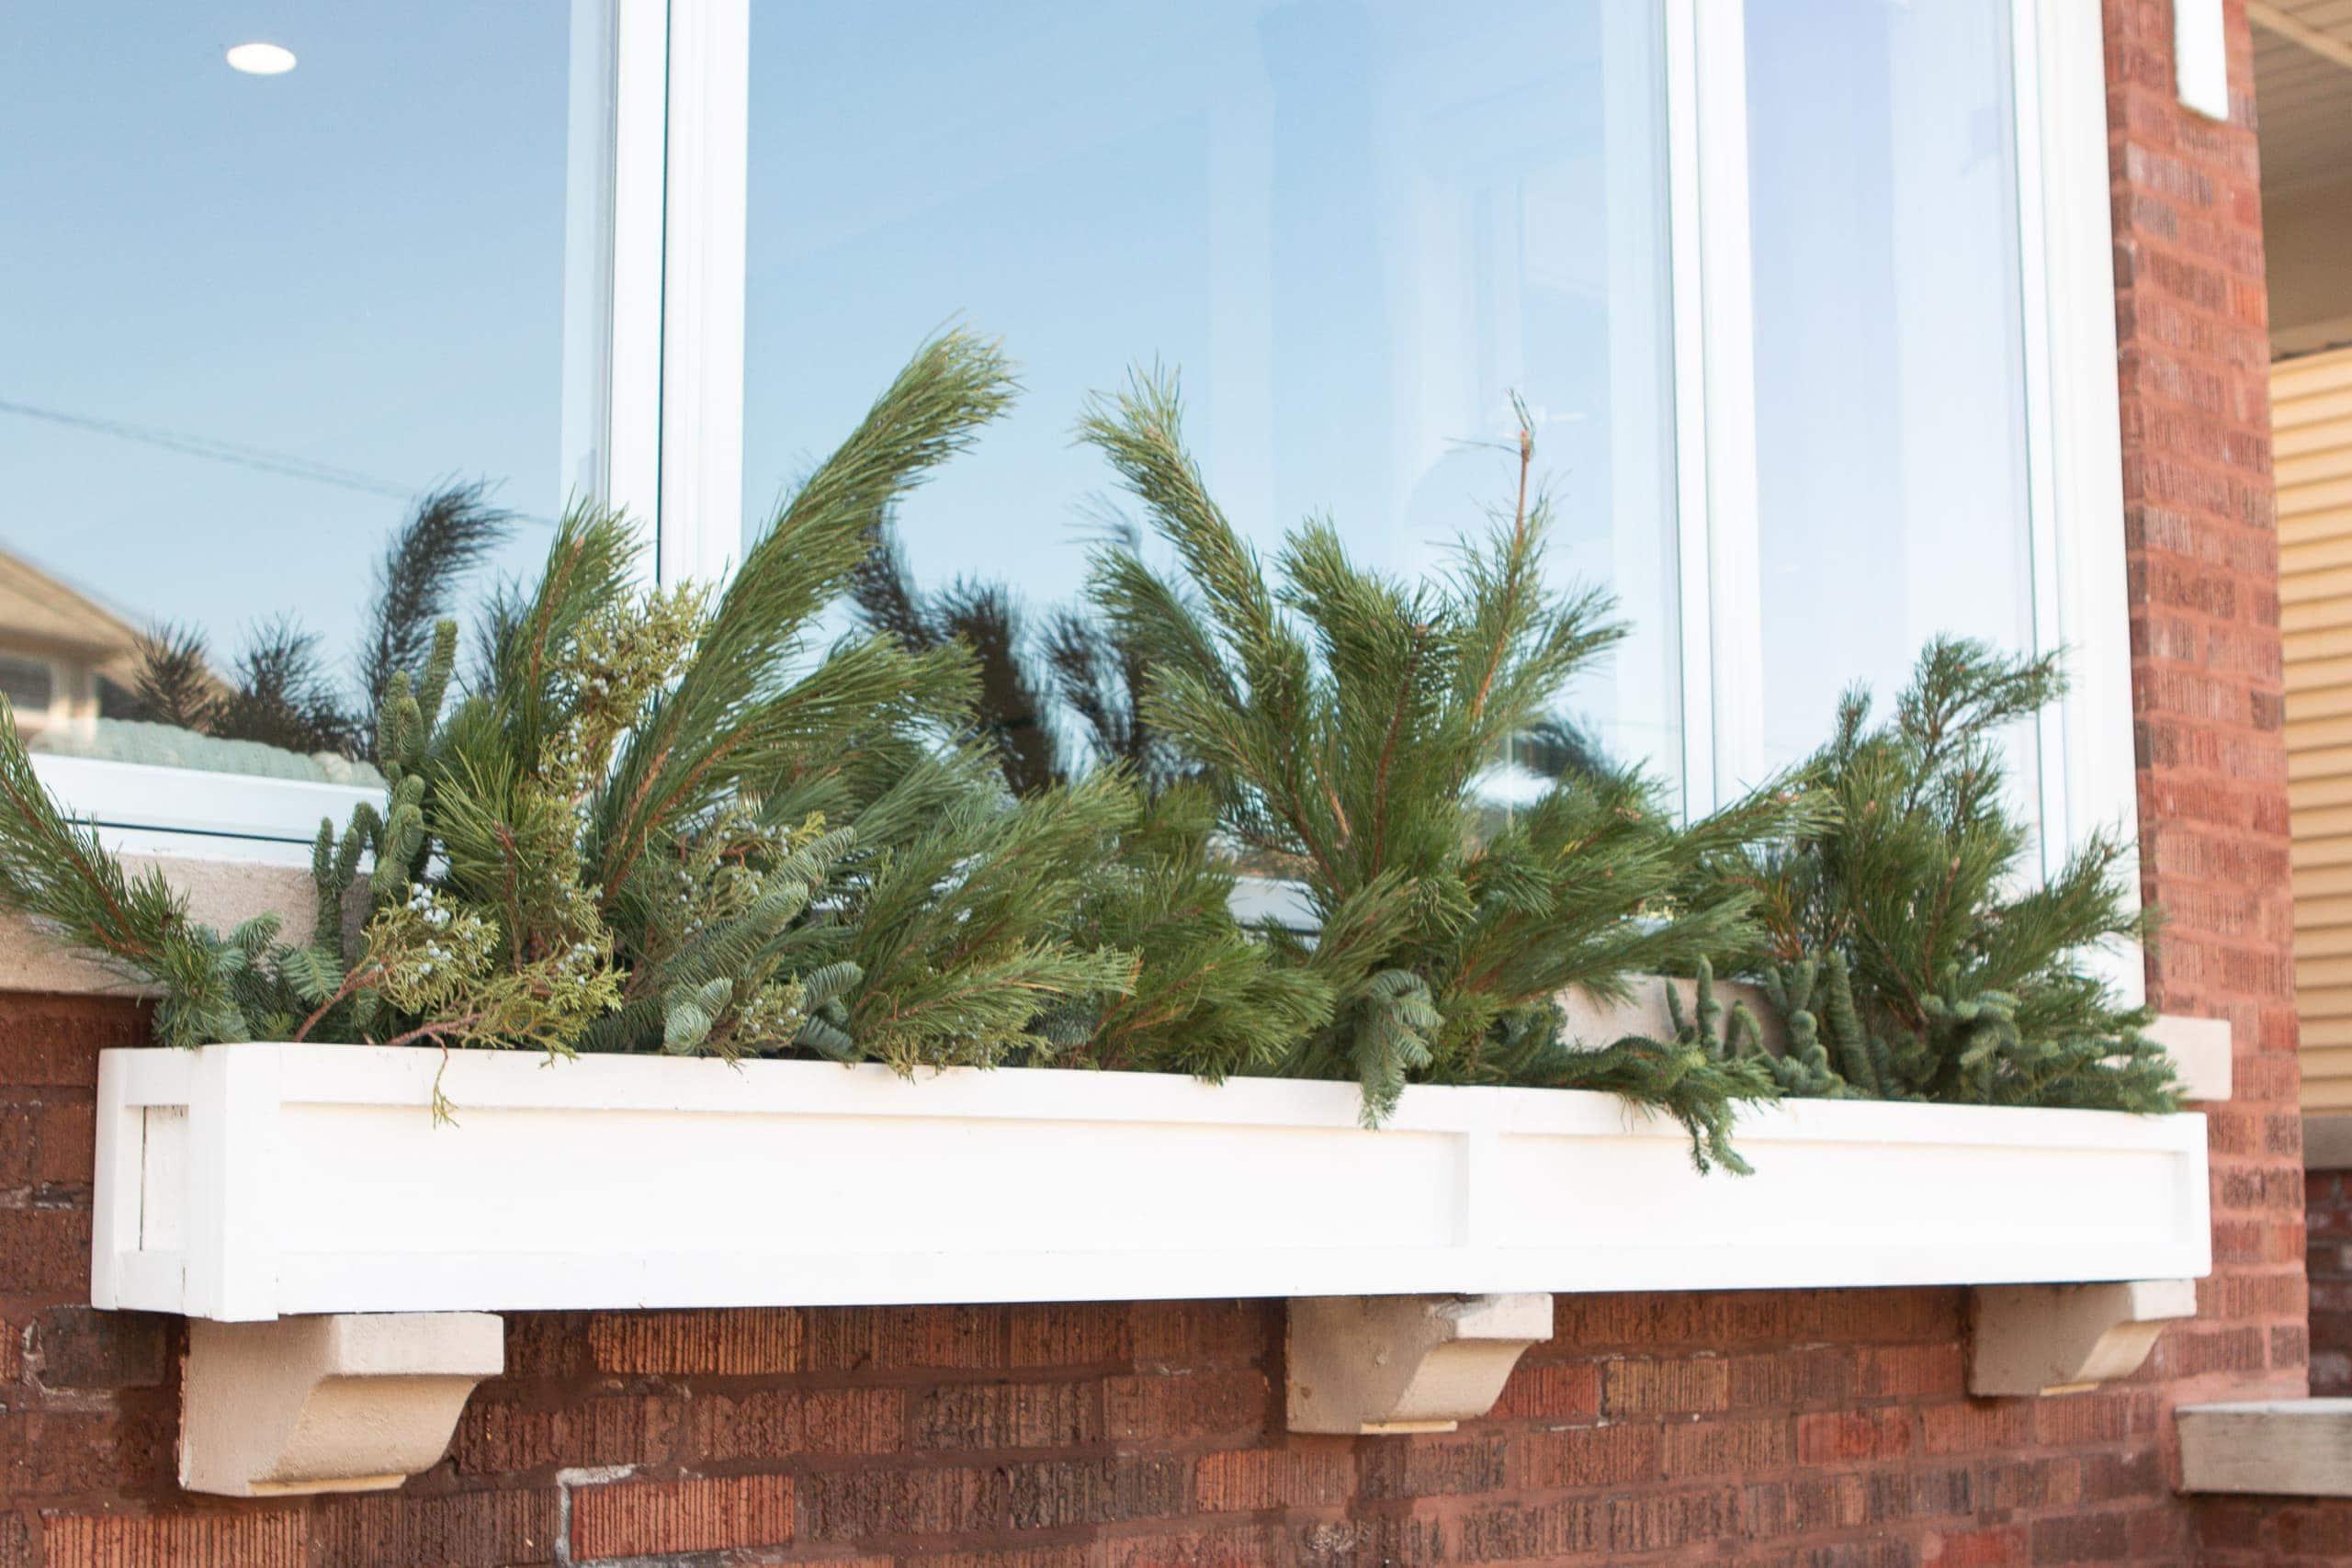 Adding greenery to a window box